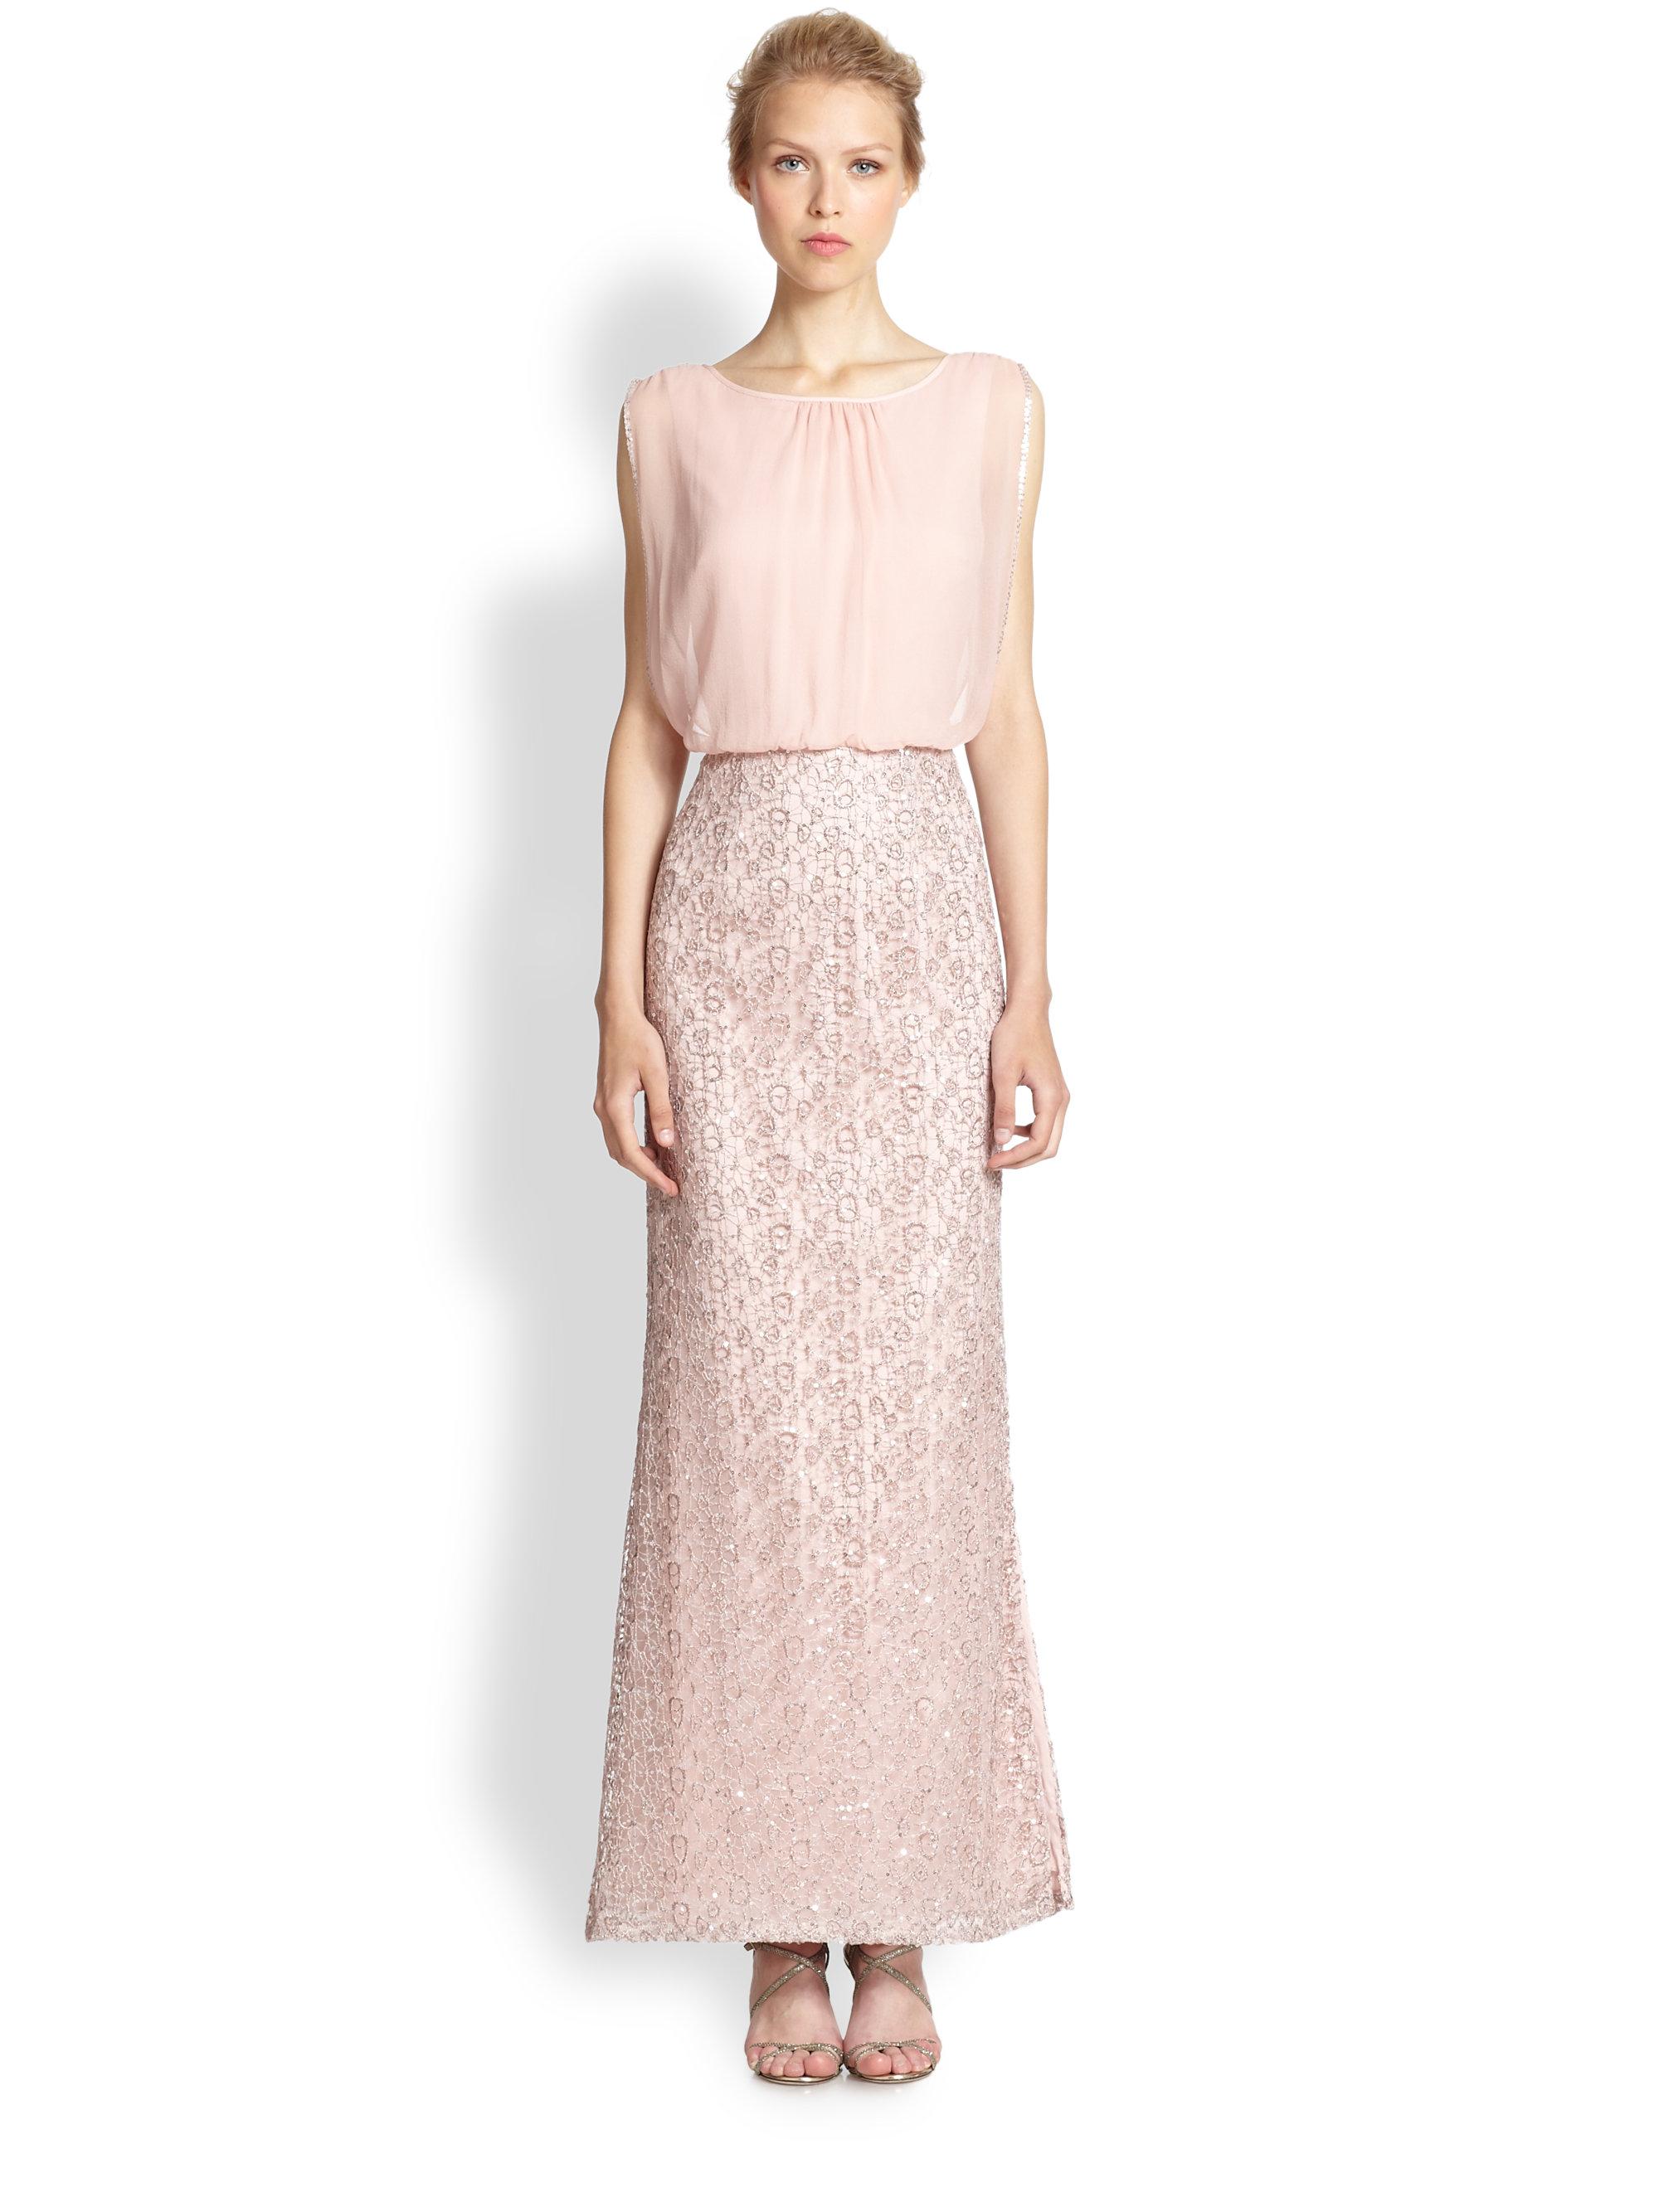 Lyst - Aidan Mattox Chiffon & Lace Blouson-Bodice Gown in Pink